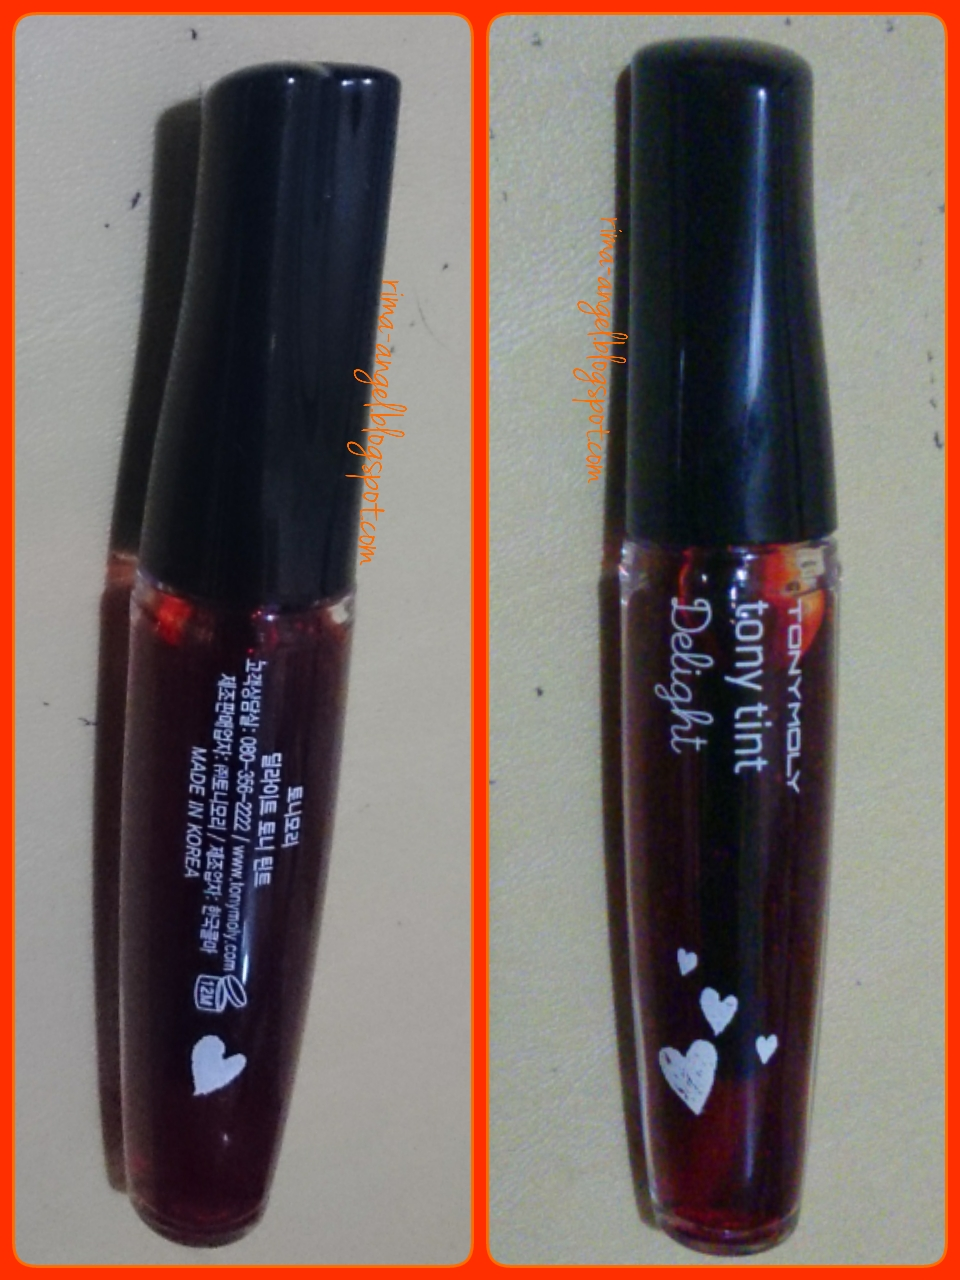 Web Versi Mobile Tony Moly Delight Lip Tint Liptint Yang Akan Saya Bahas Ini Dari Dengan Nama Warna Orange